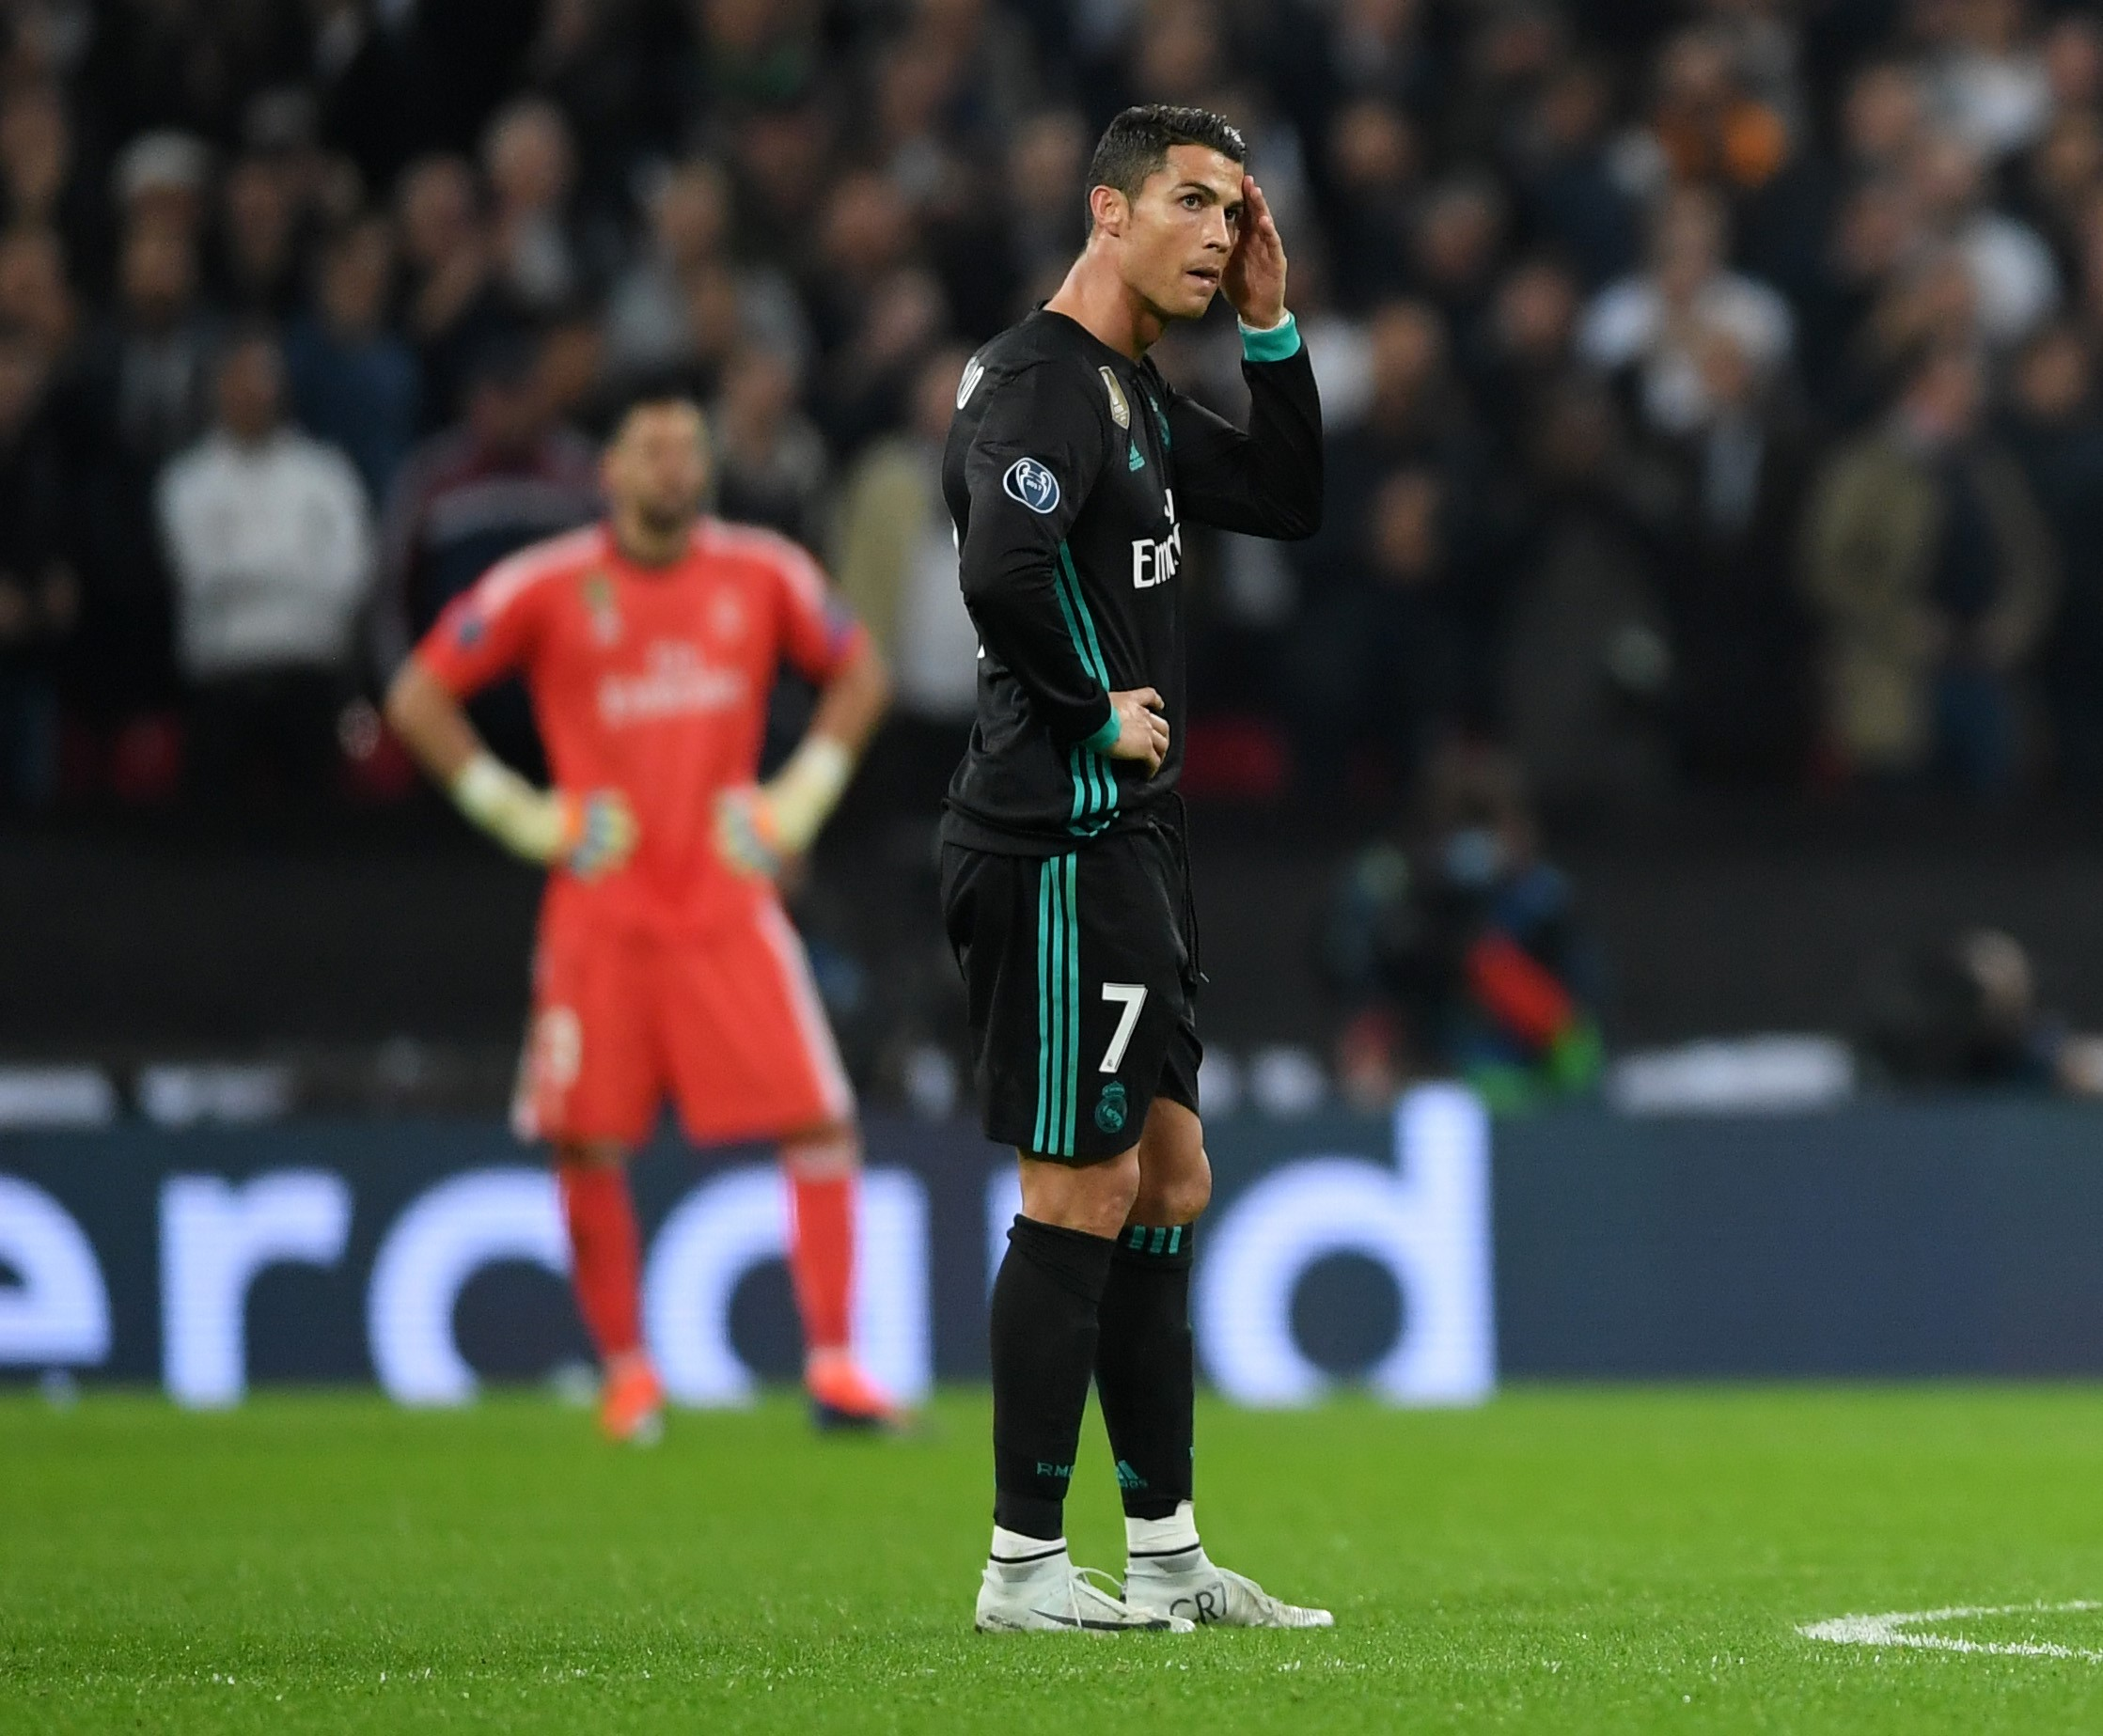 Криштиану Роналду, «Реал Мадрид»